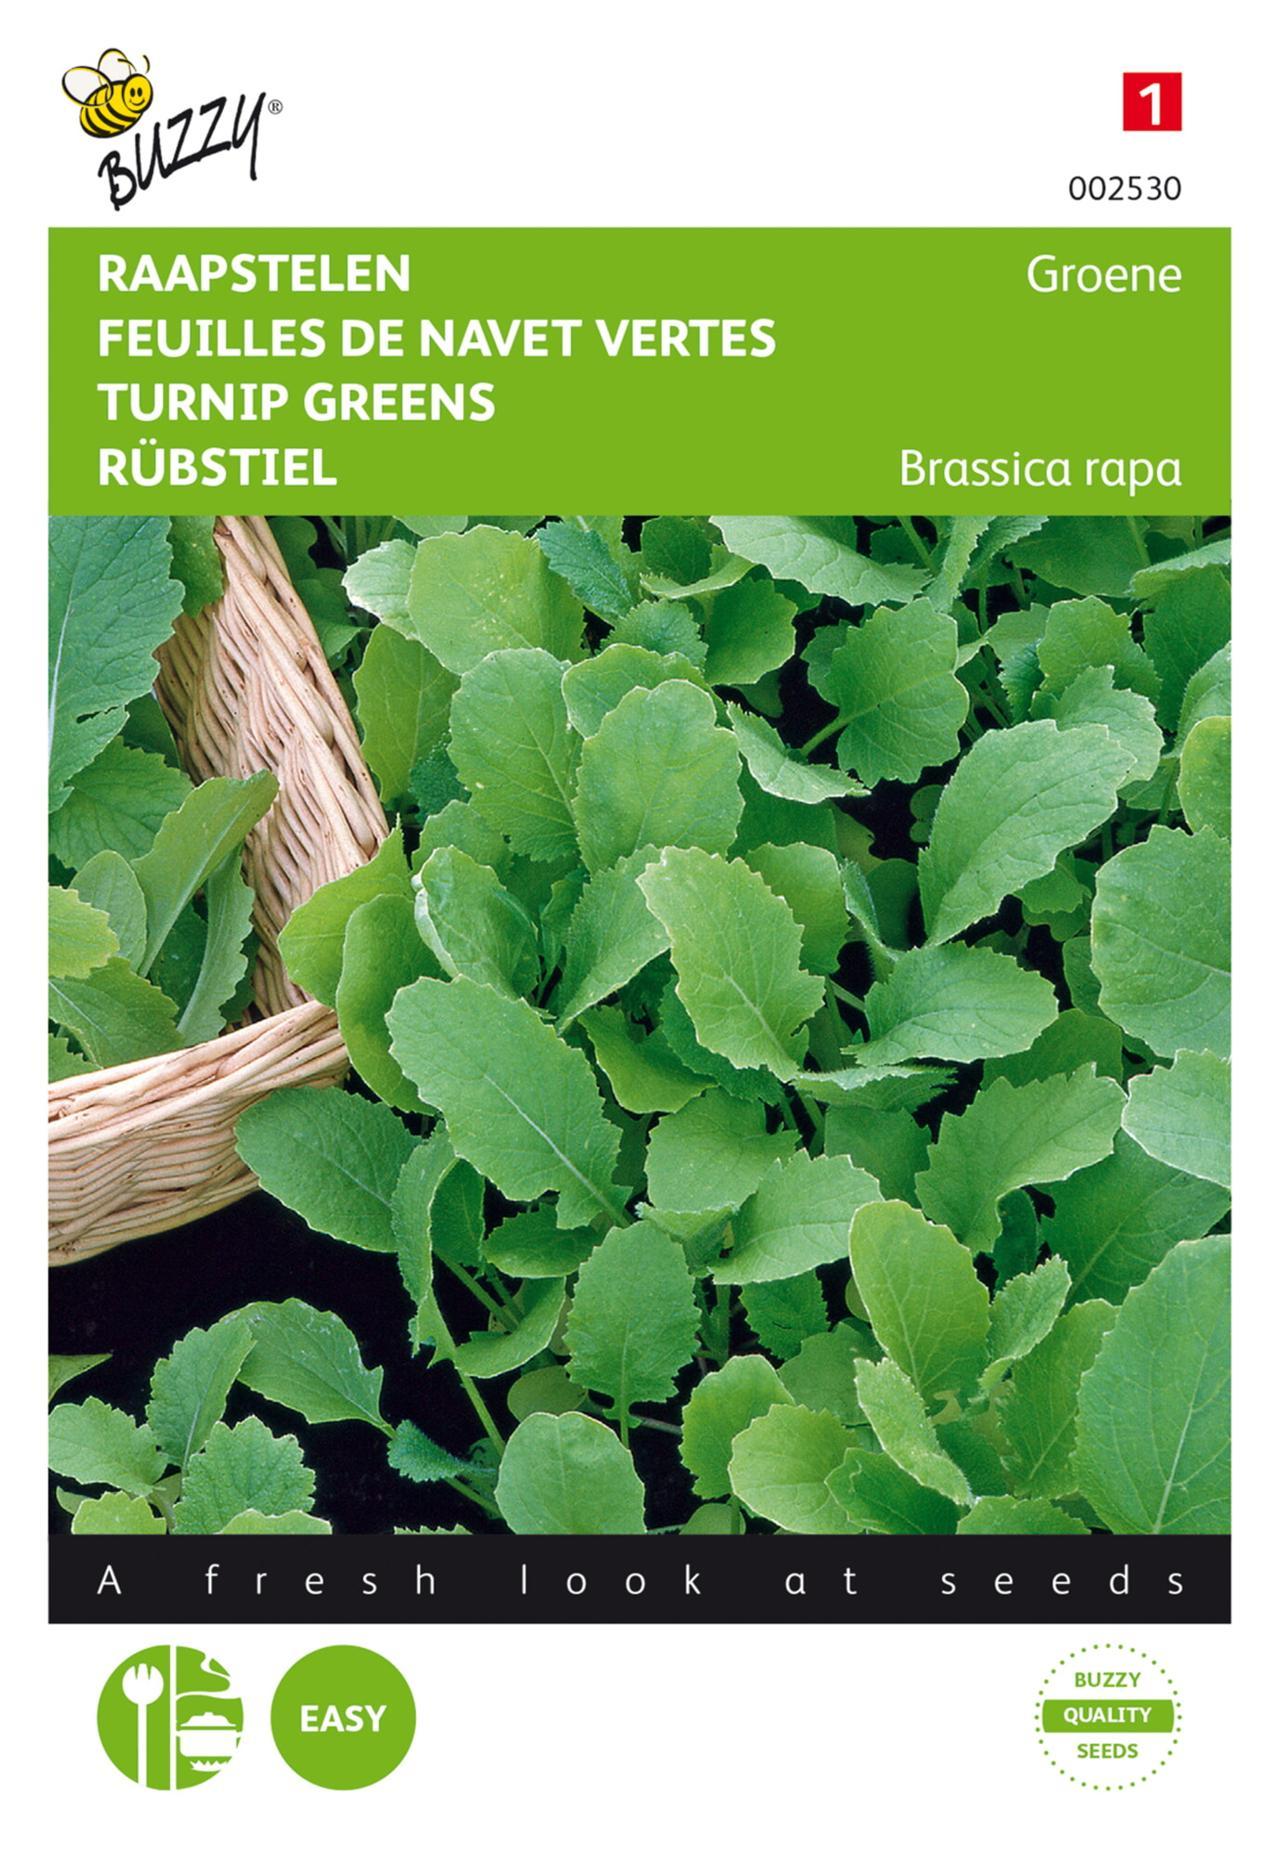 Brassica rapa 'Groene' plant